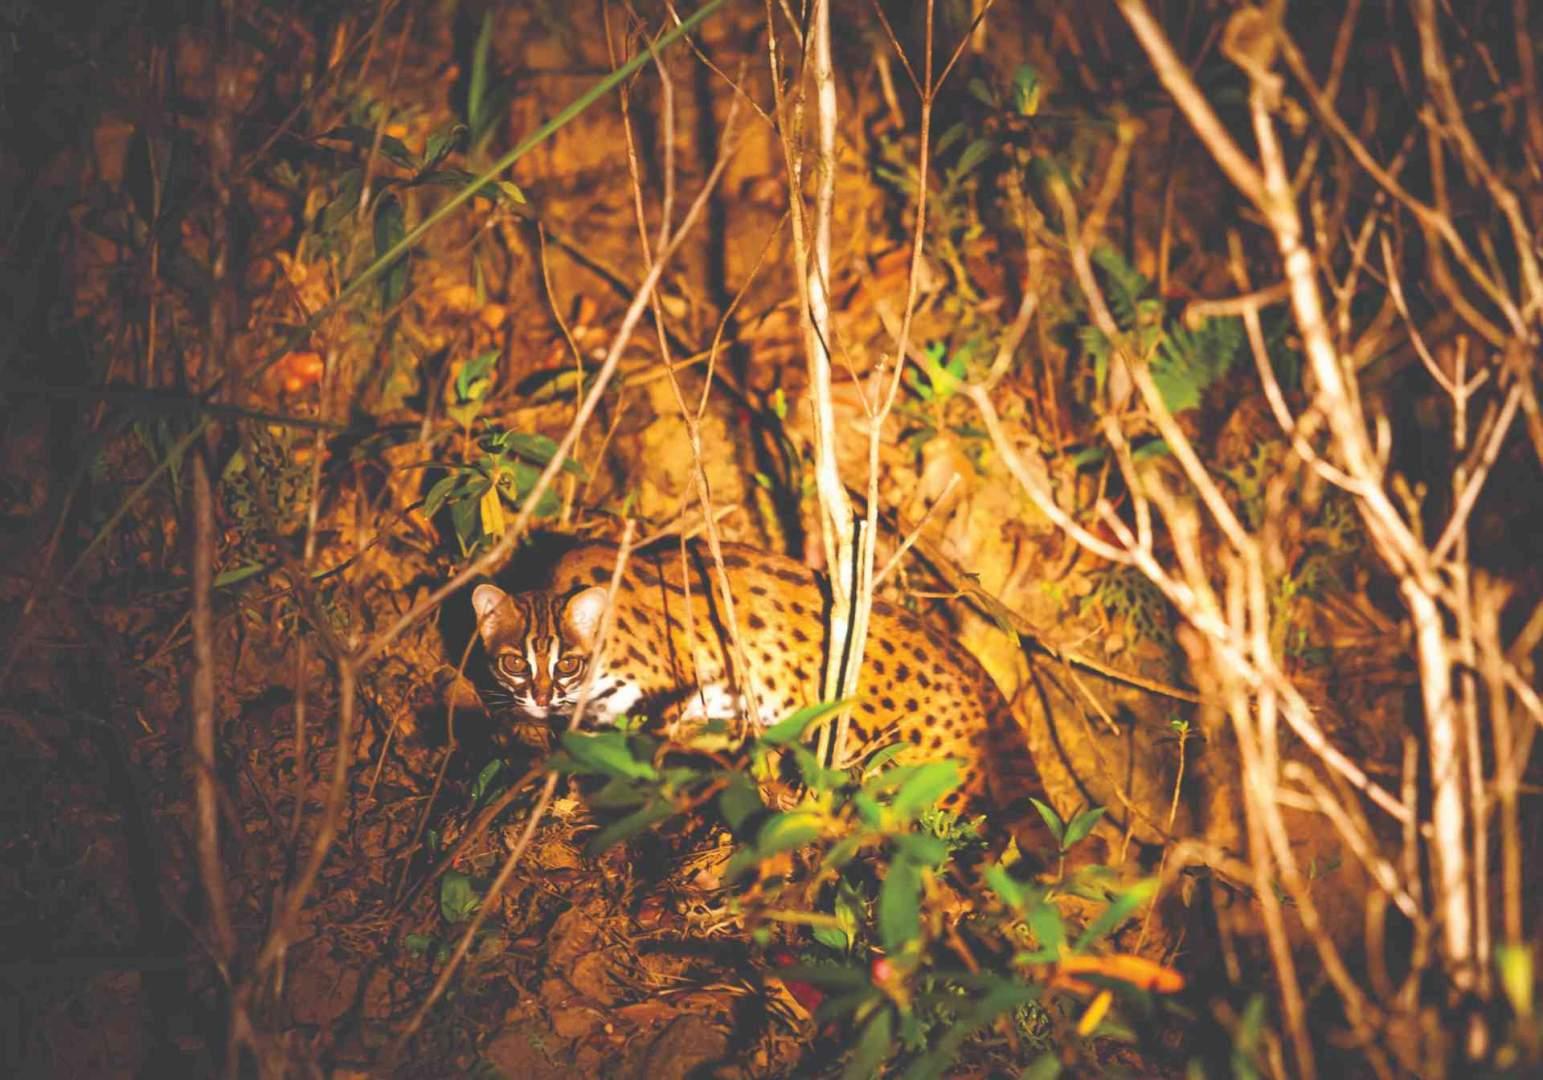 Borneo Jungle Malaysia _O'connor 6